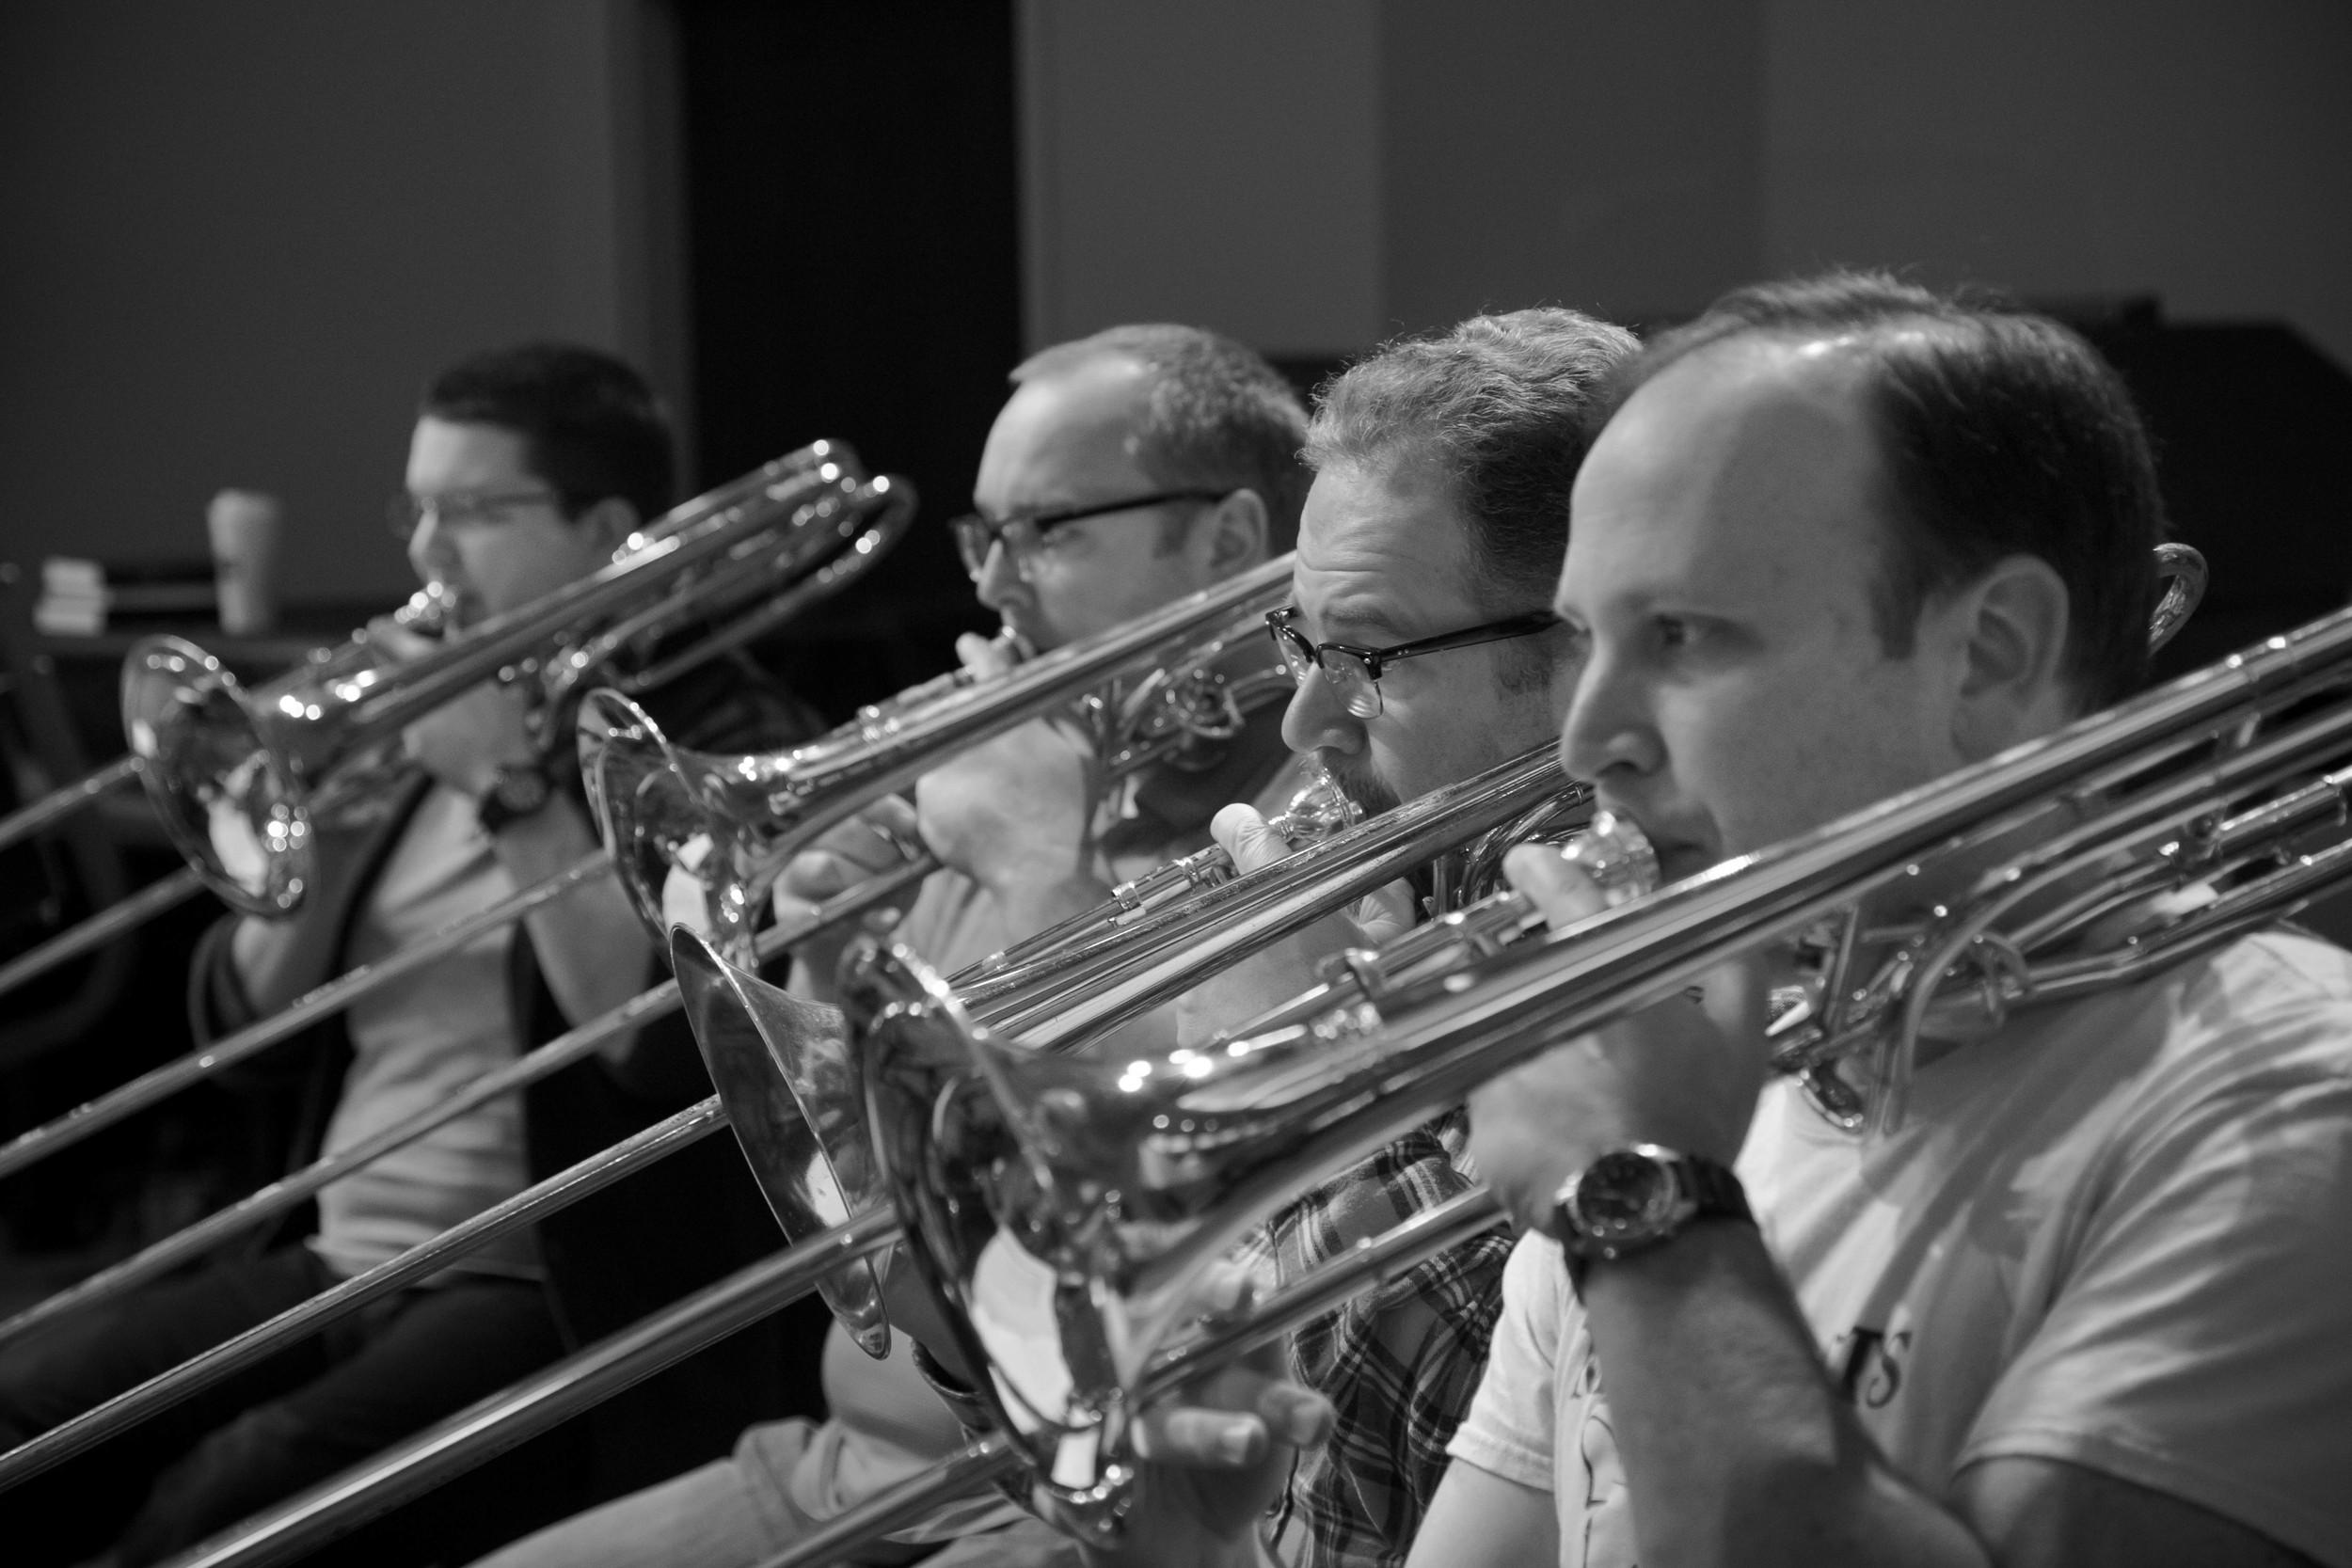 Trombone section: Jason Hathorn, Clarence White, Tom Hanton, Matt Broome